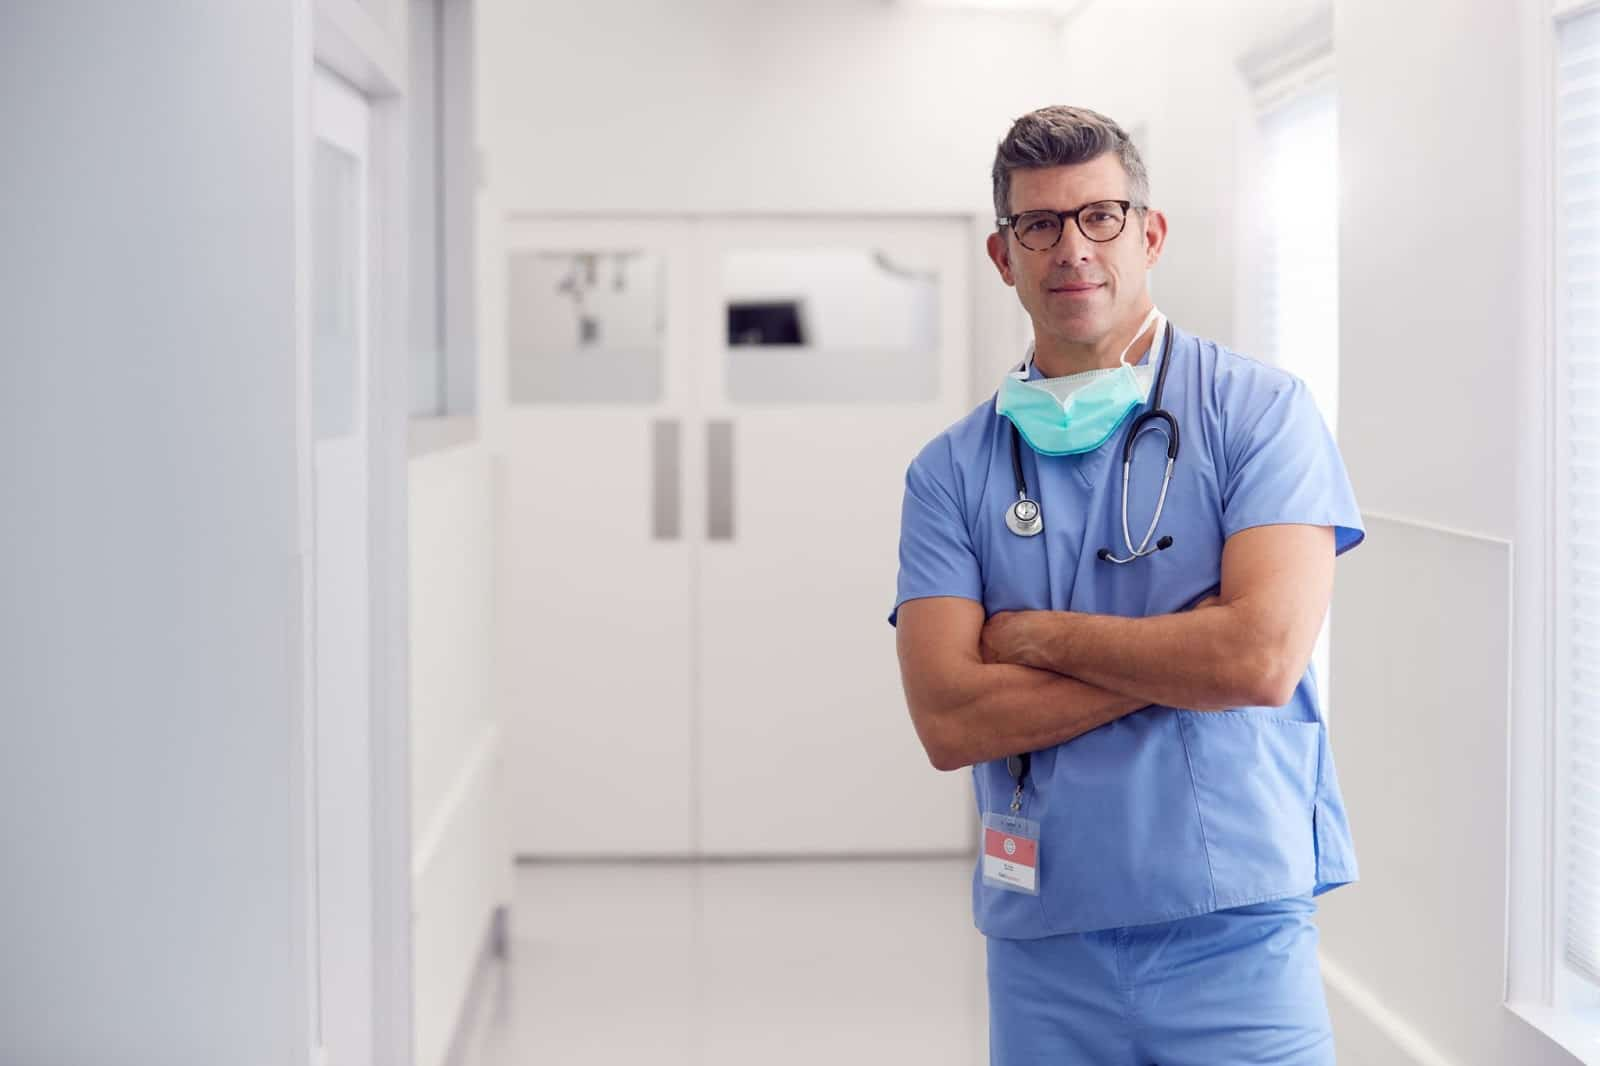 Surgeon standing in hospital hallway